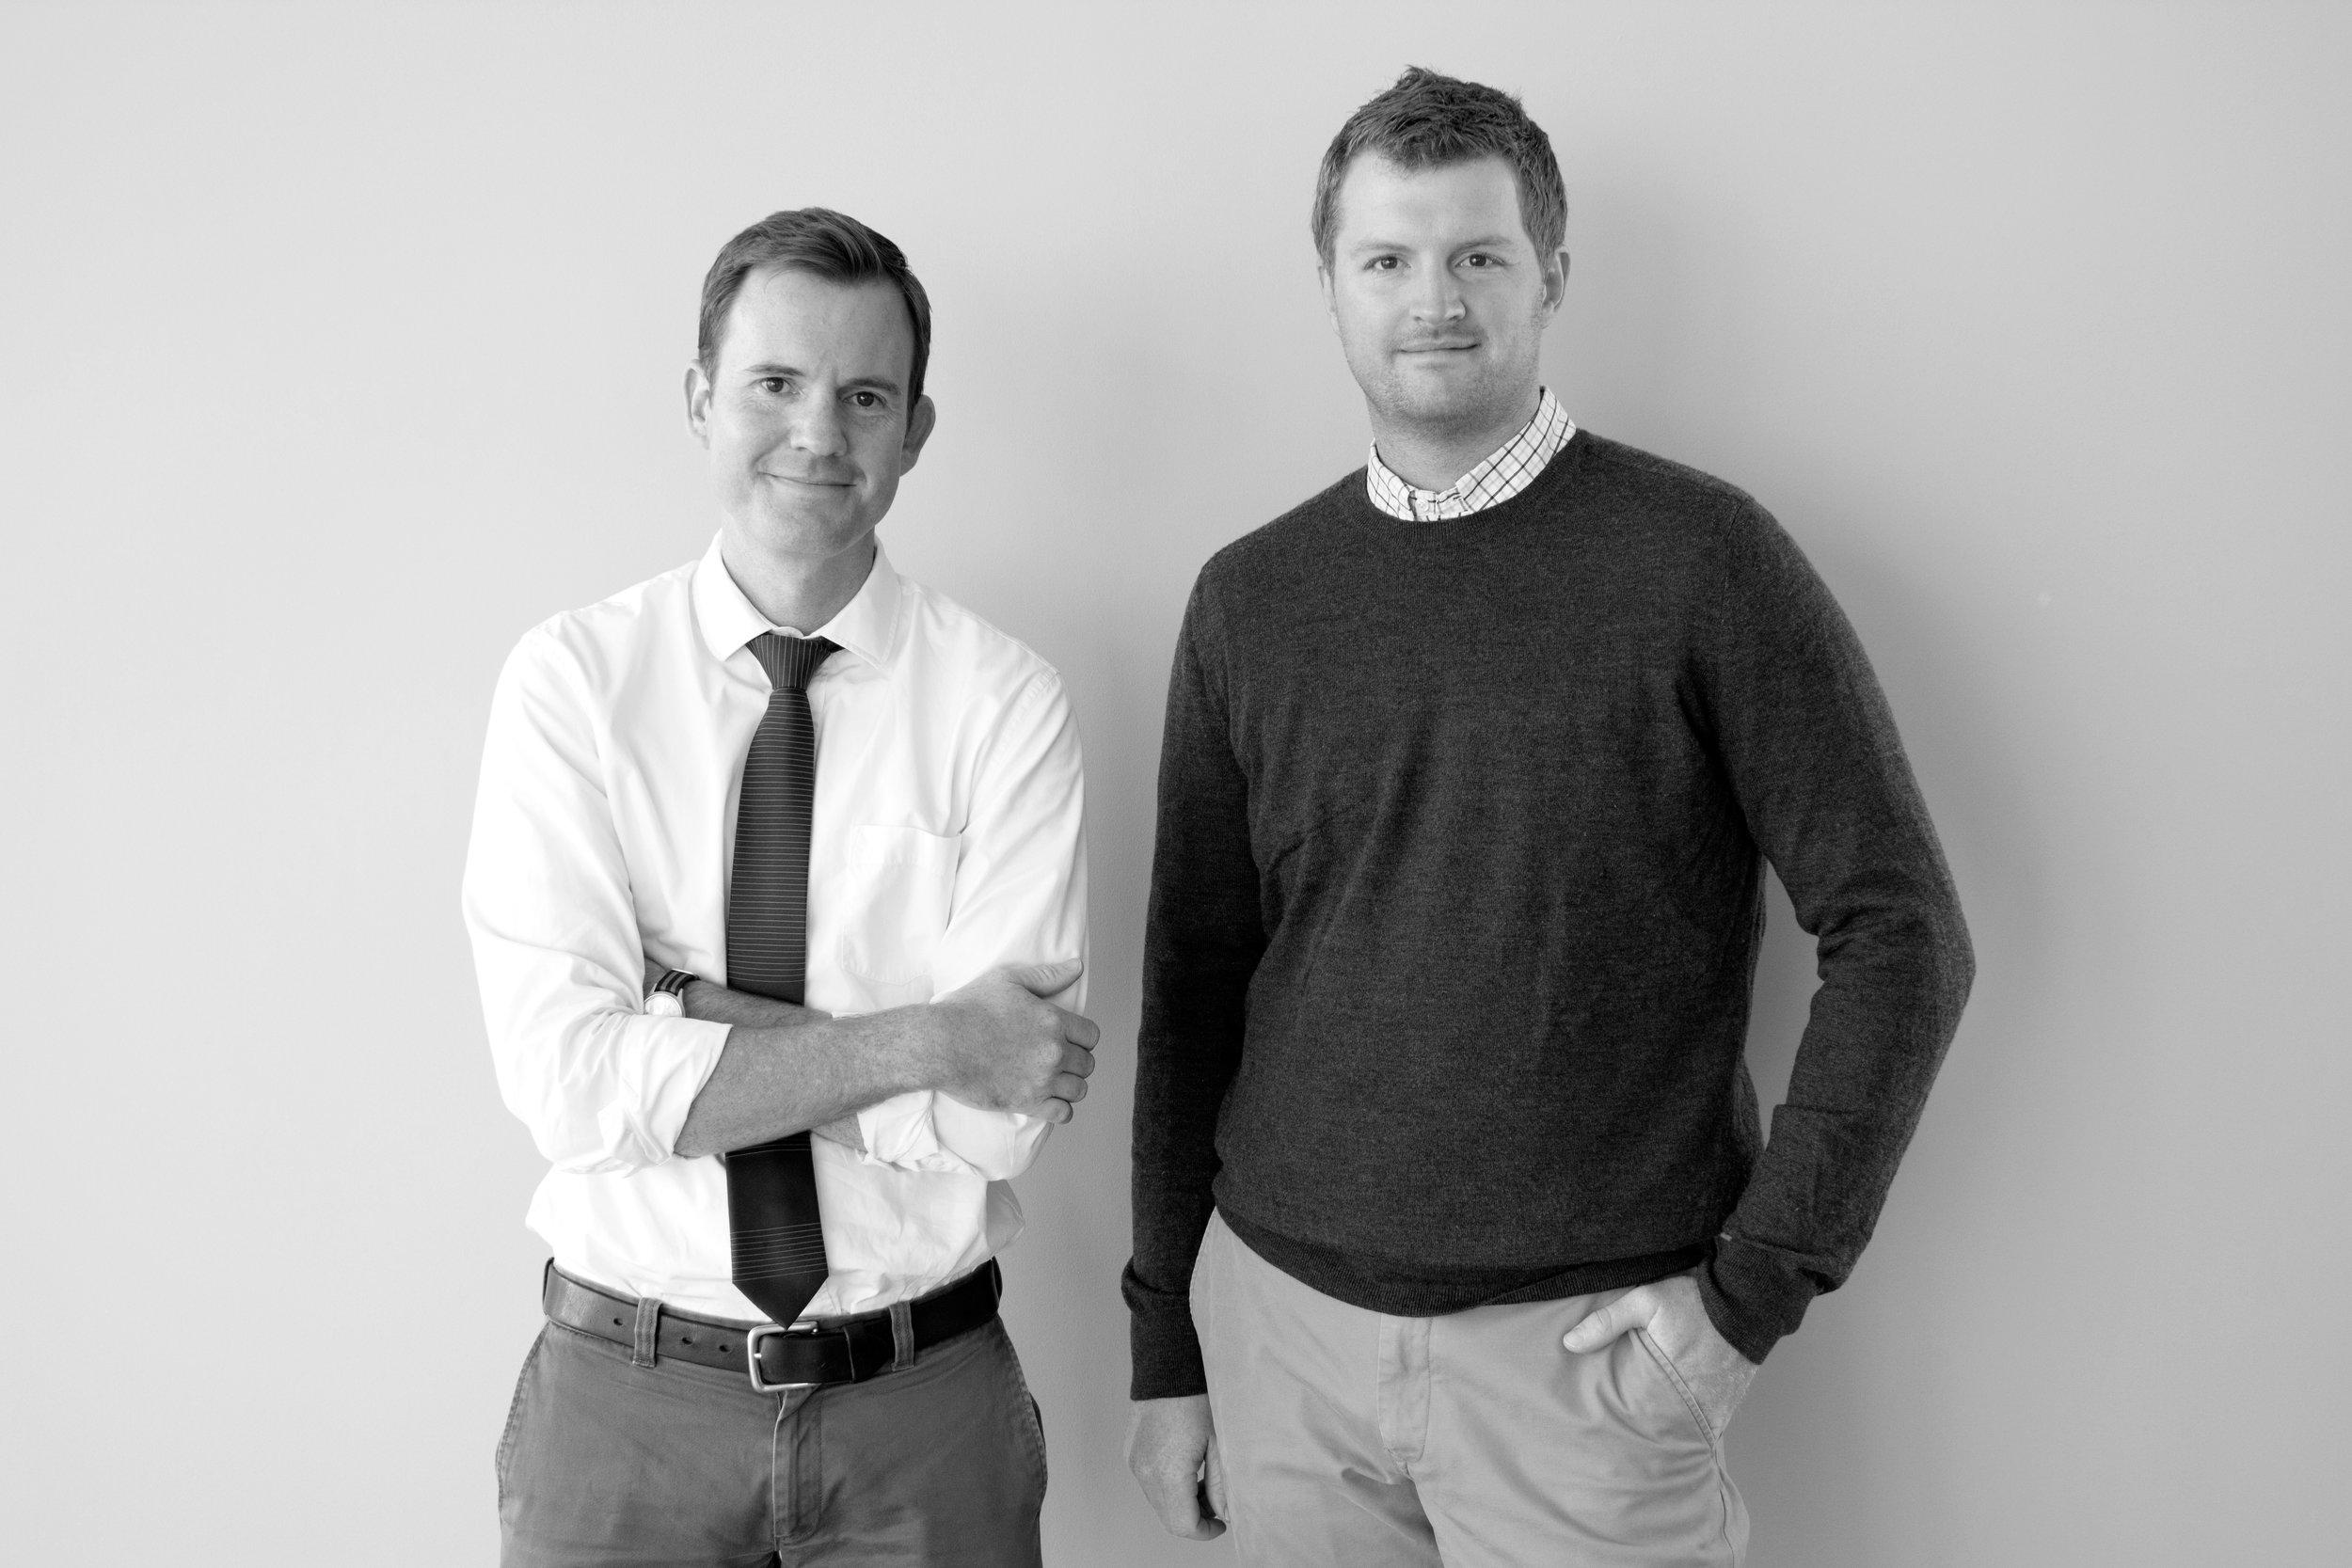 Kevin Wright and Joe Nickol